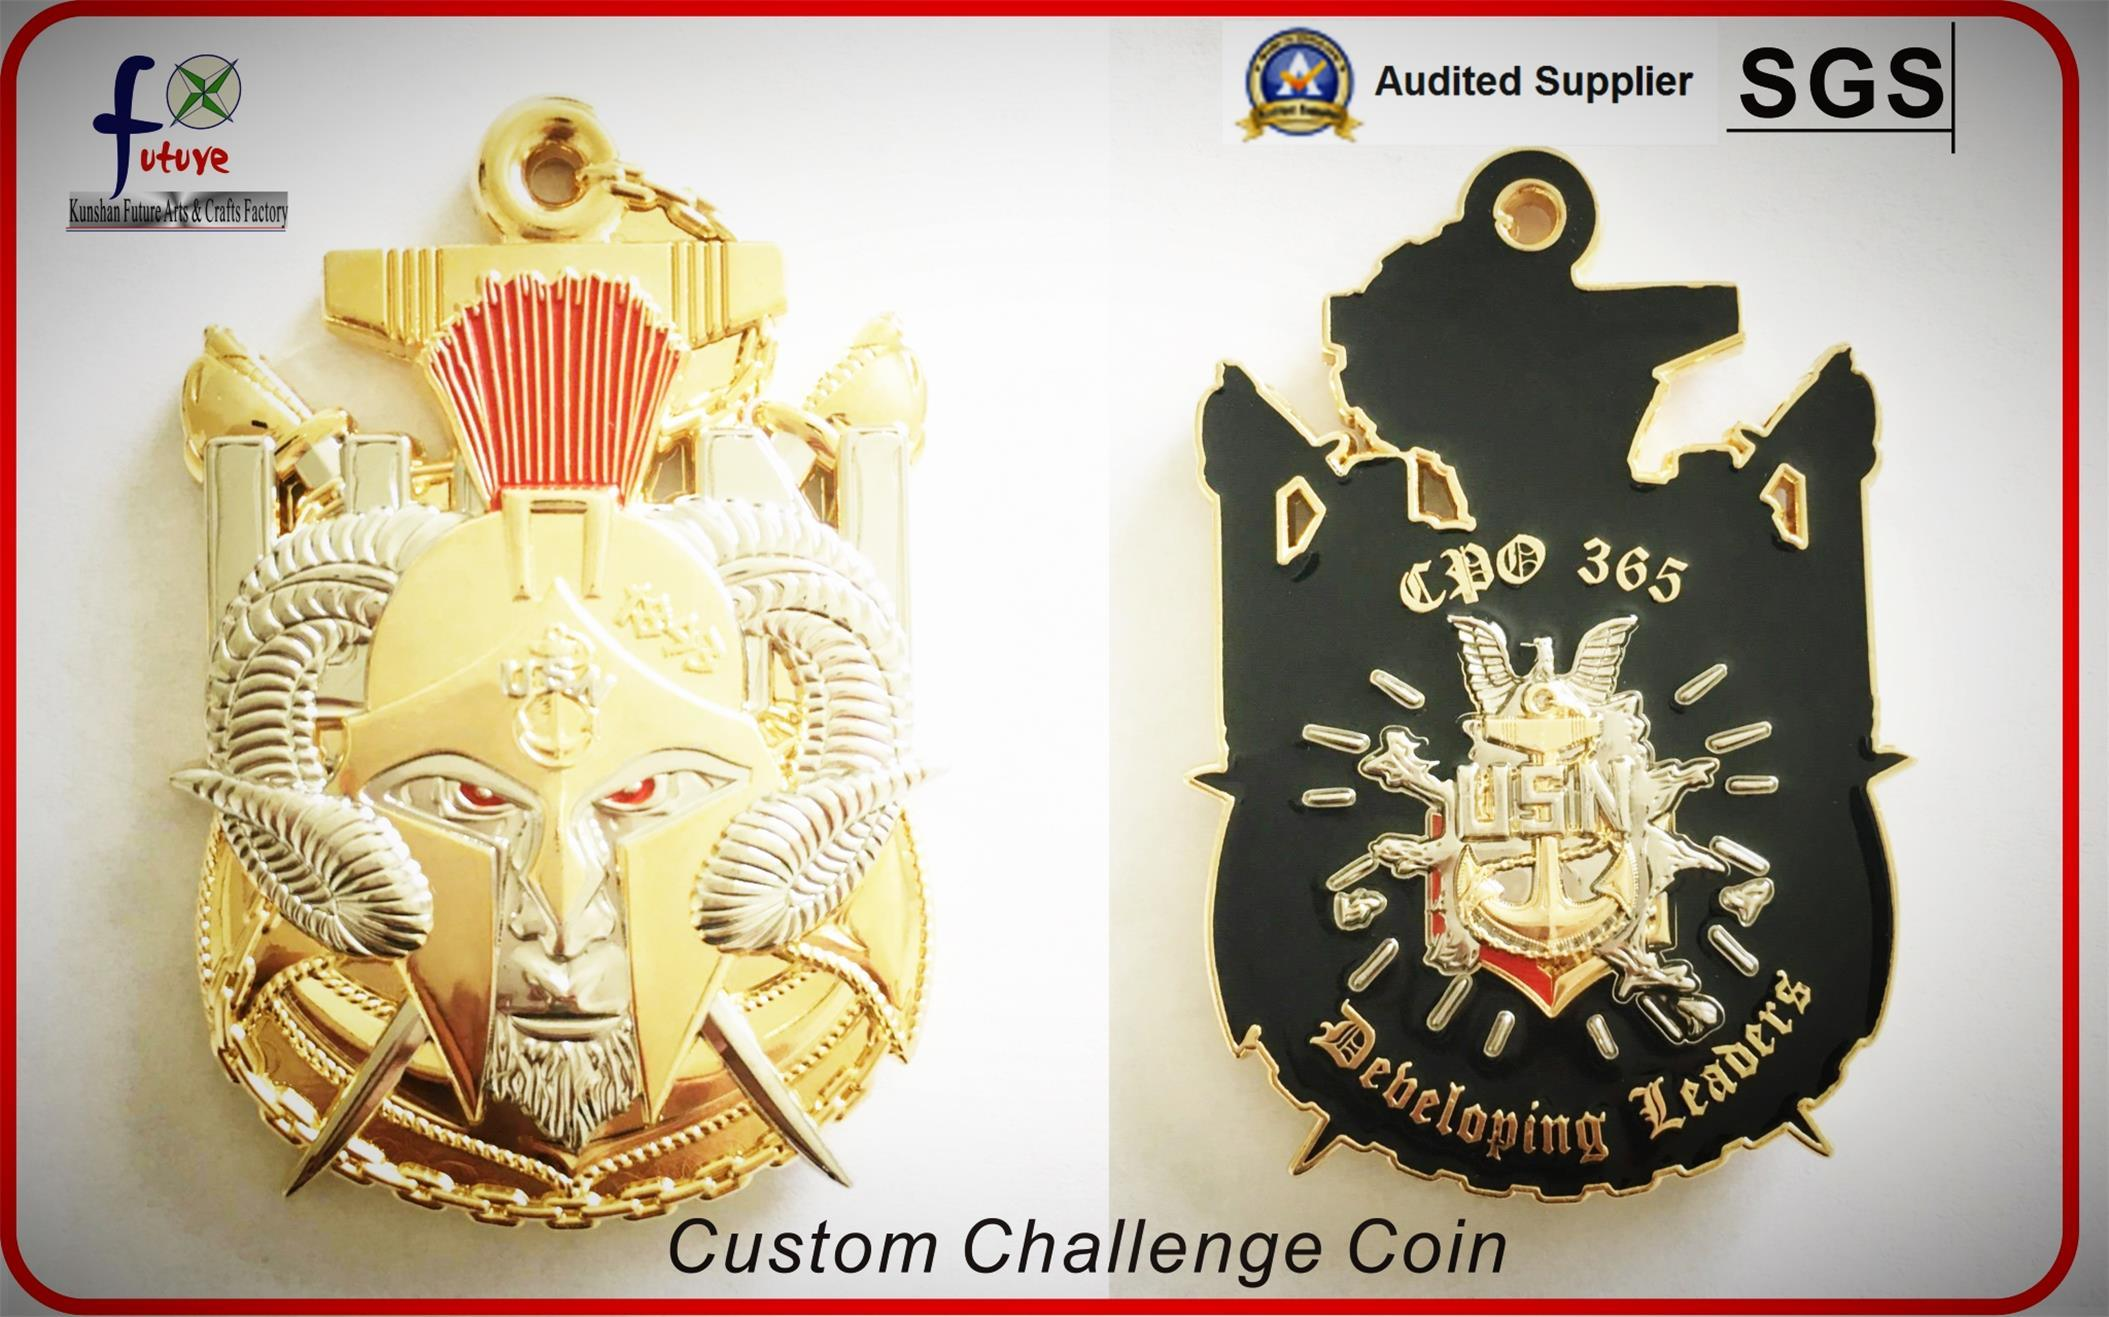 Custom Challenge Coin Usn Coin